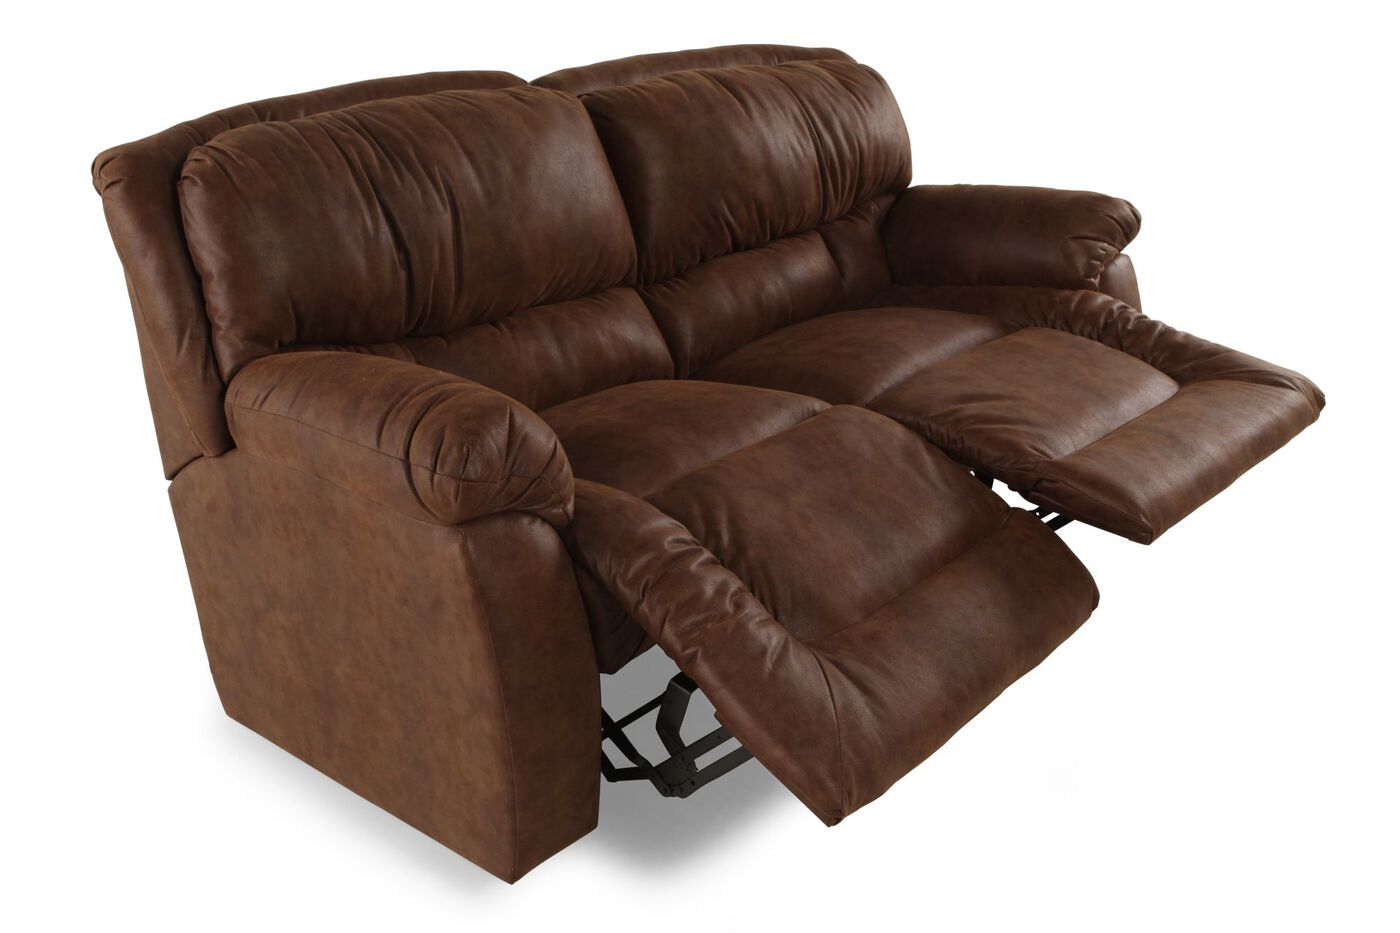 Lane Orlando Walnut Reclining Sofa Mathis Brothers Furniture